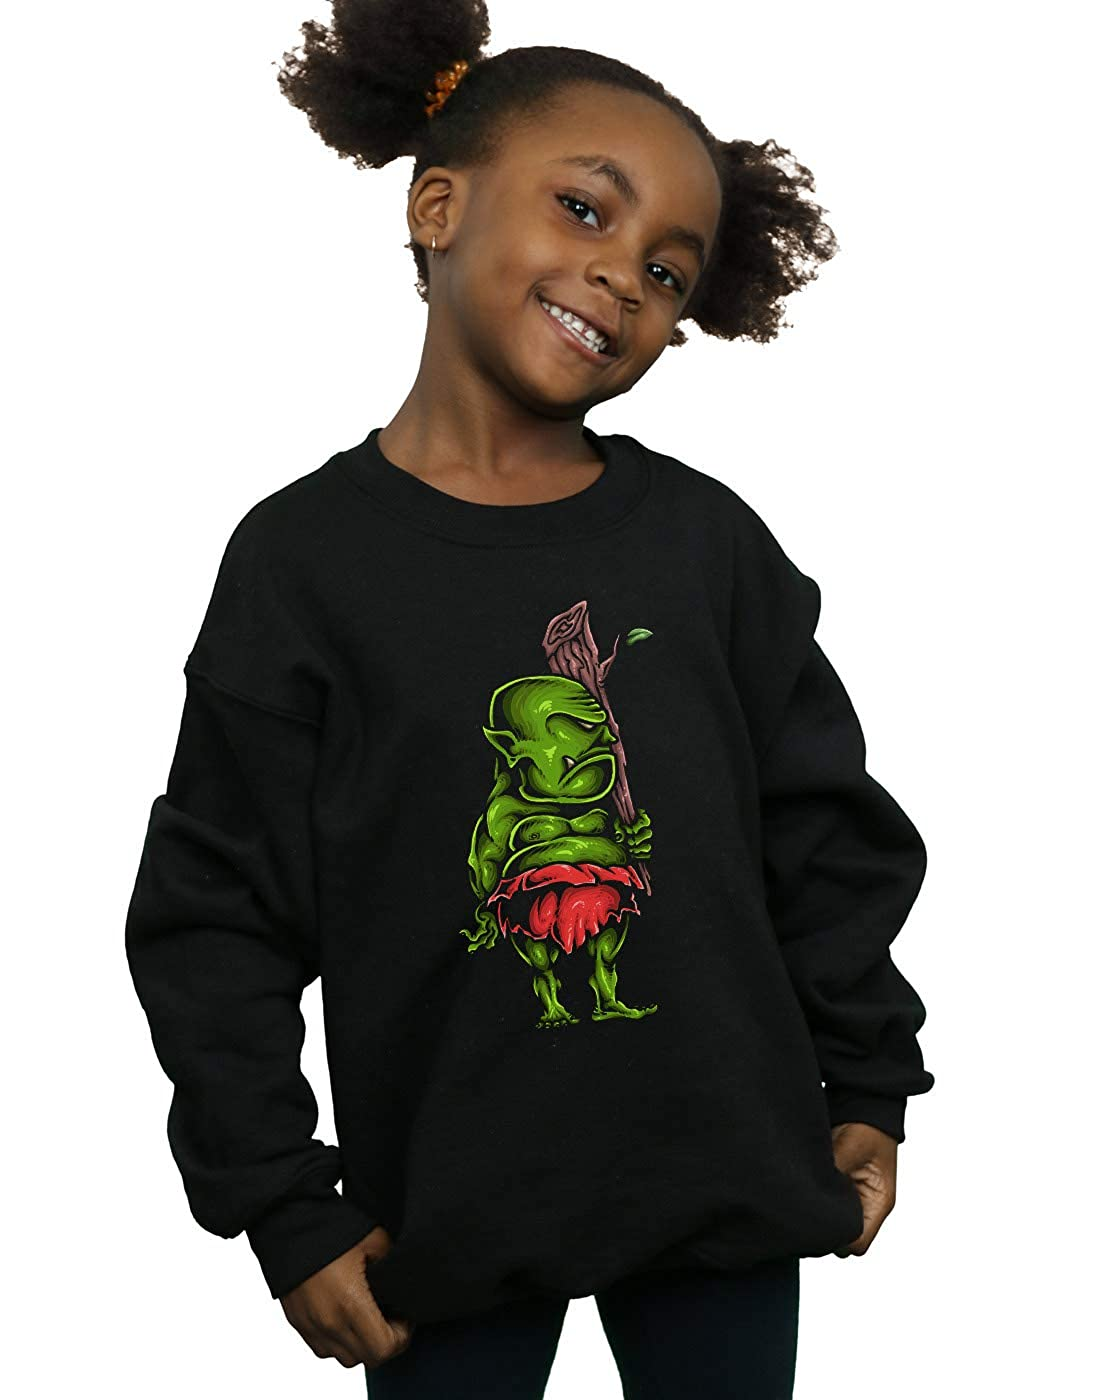 Absolute Cult Drewbacca Girls Green Ogre Sweatshirt